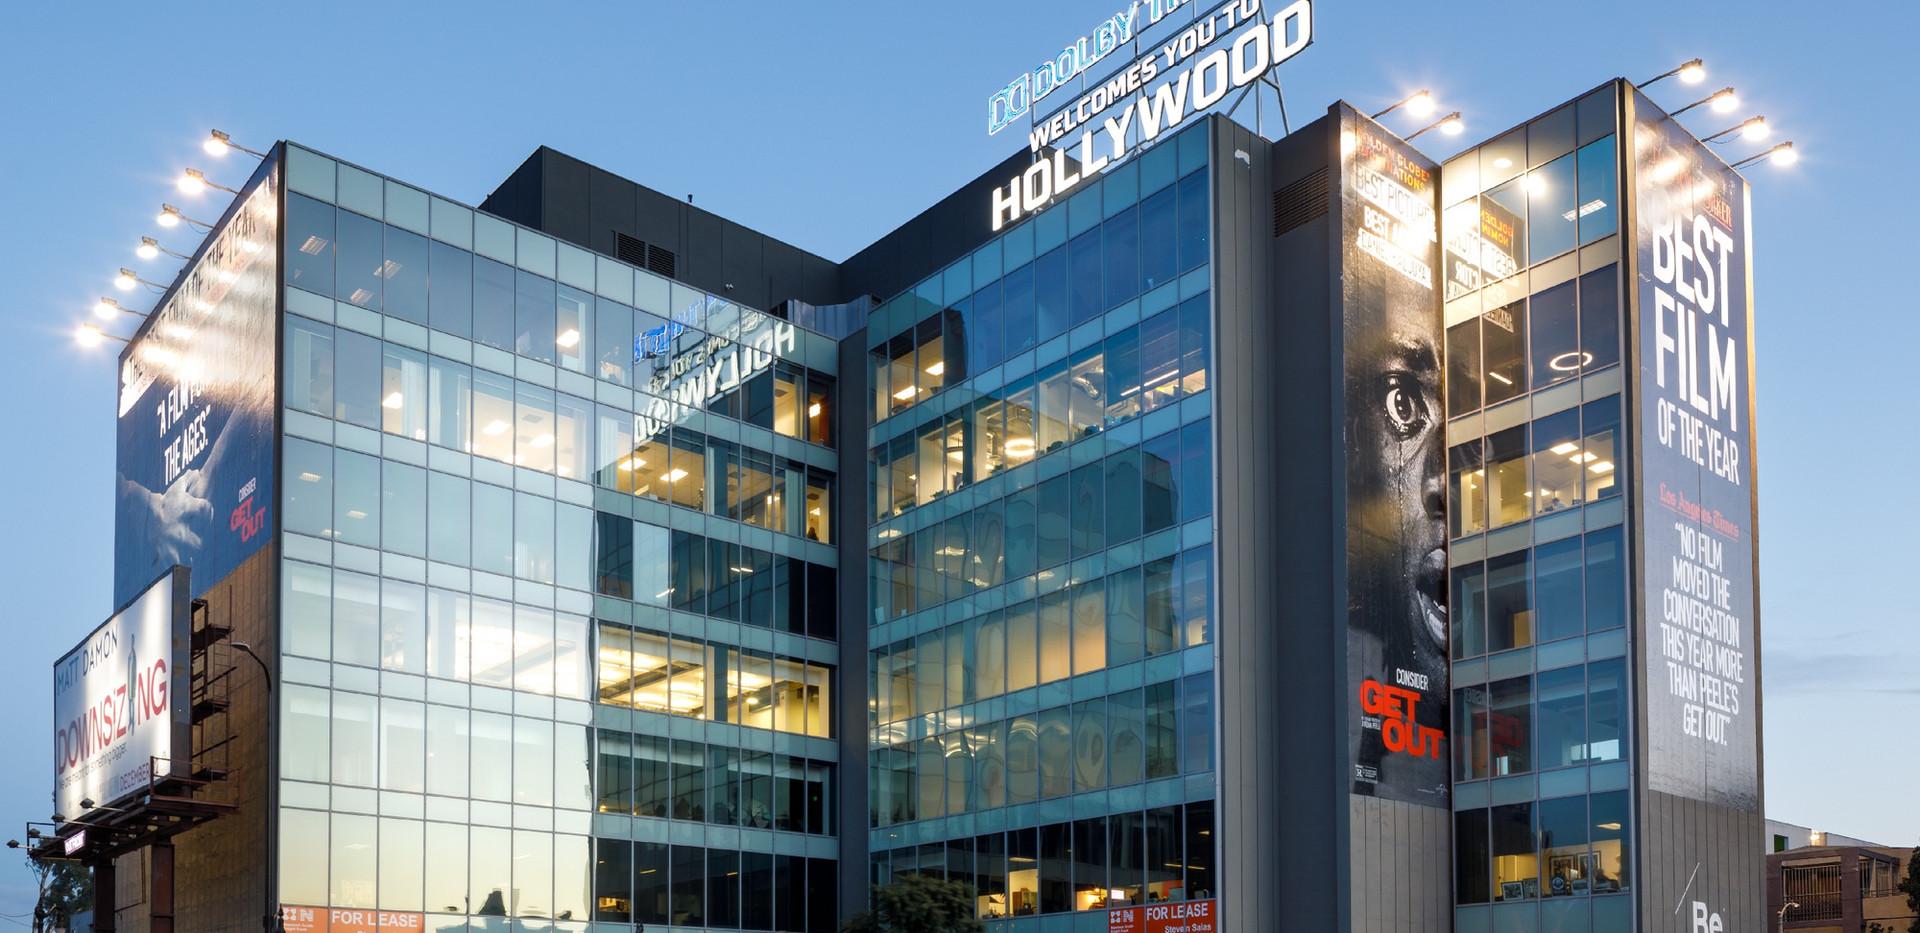 1800 N Highland Hollywood - 088_edited.j